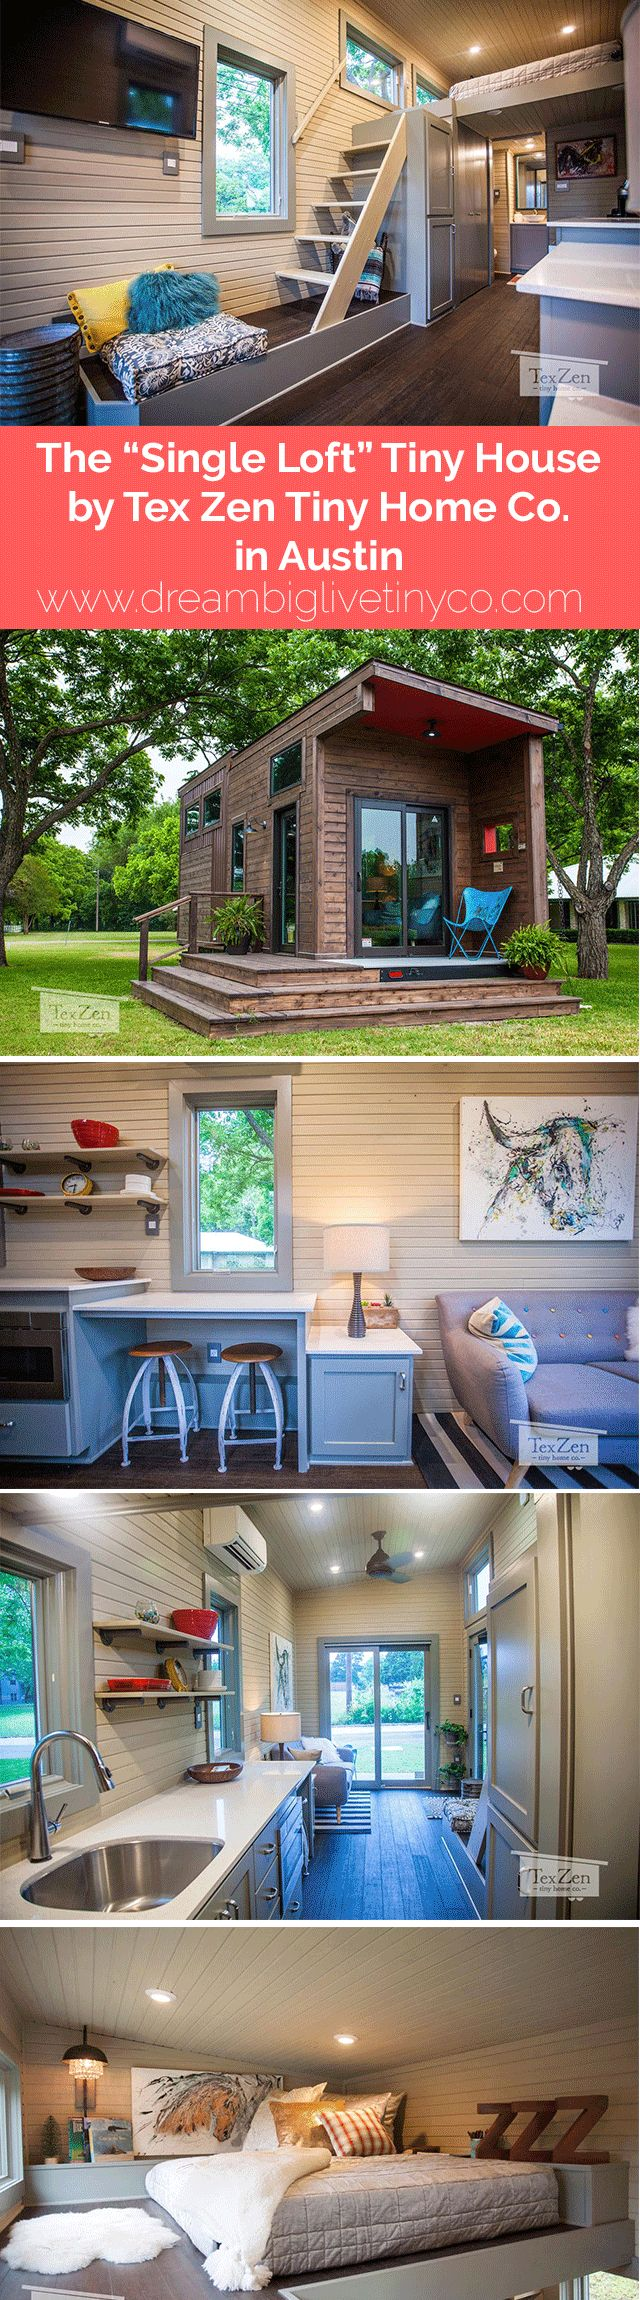 "The ""Single Loft"" Tiny House by Tex Zen Tiny Home Co. in Austin"